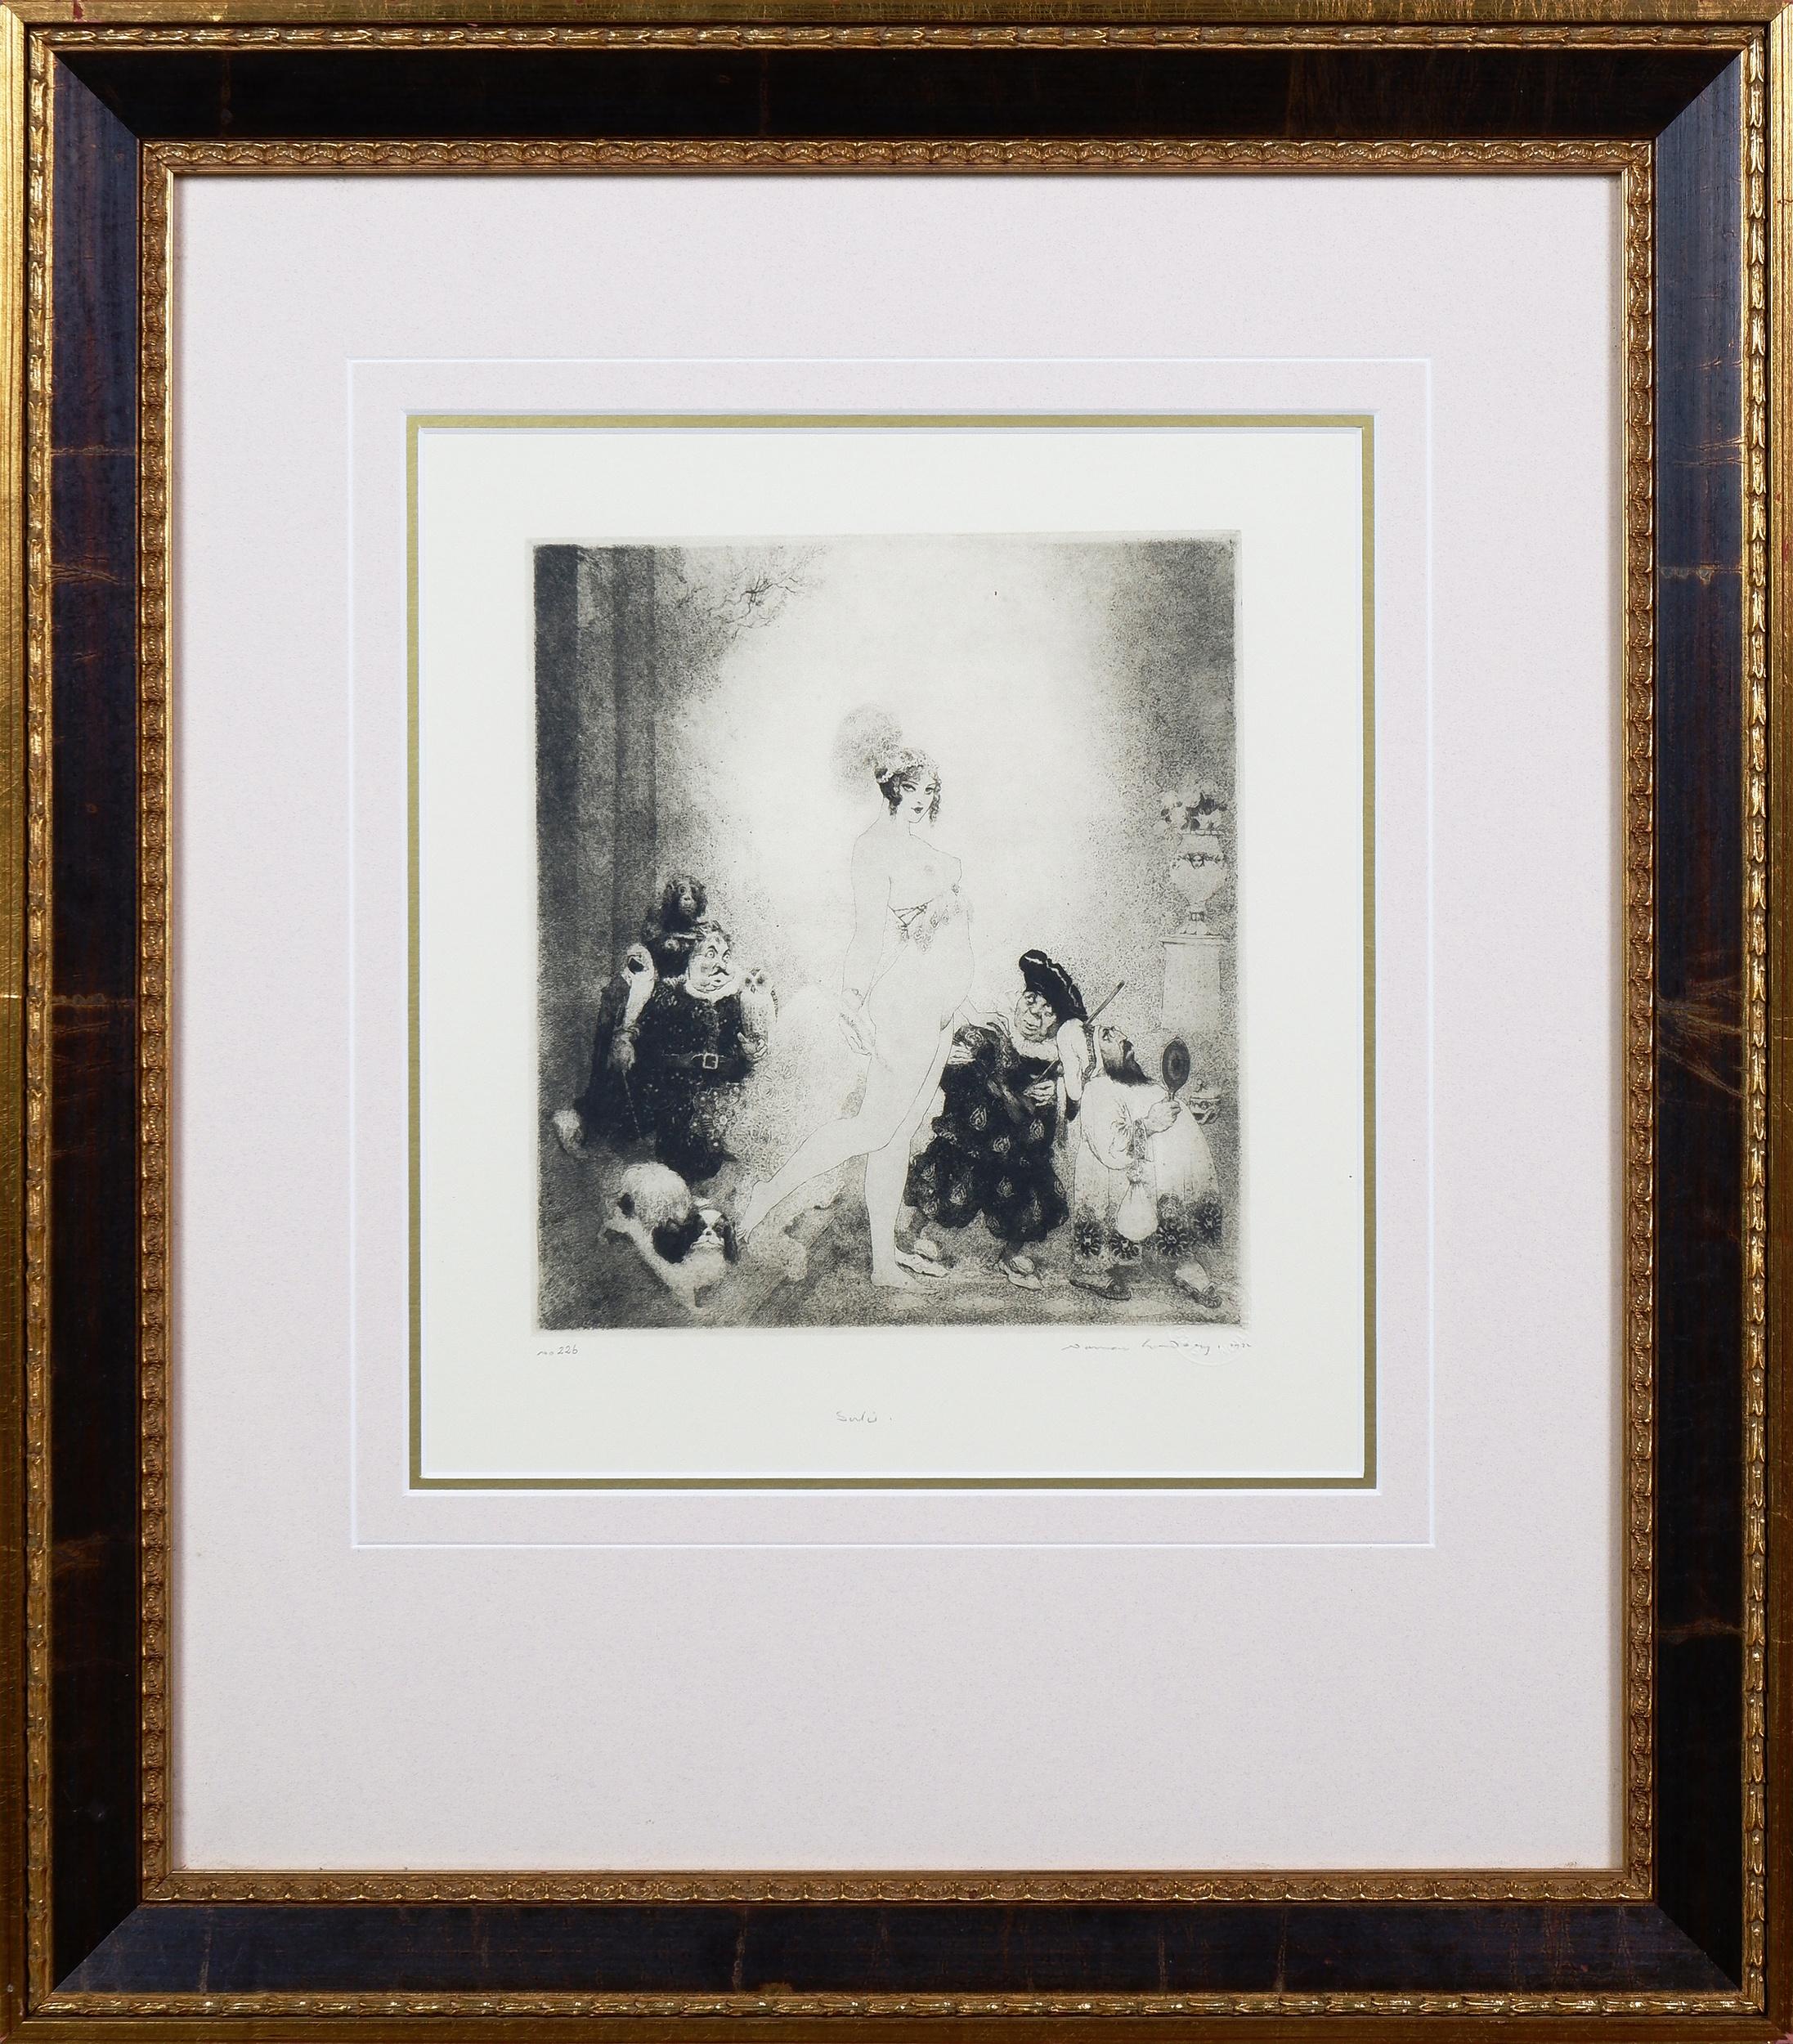 'Norman Lindsay (1879-1969), Sortie, Facsimilie Etching'